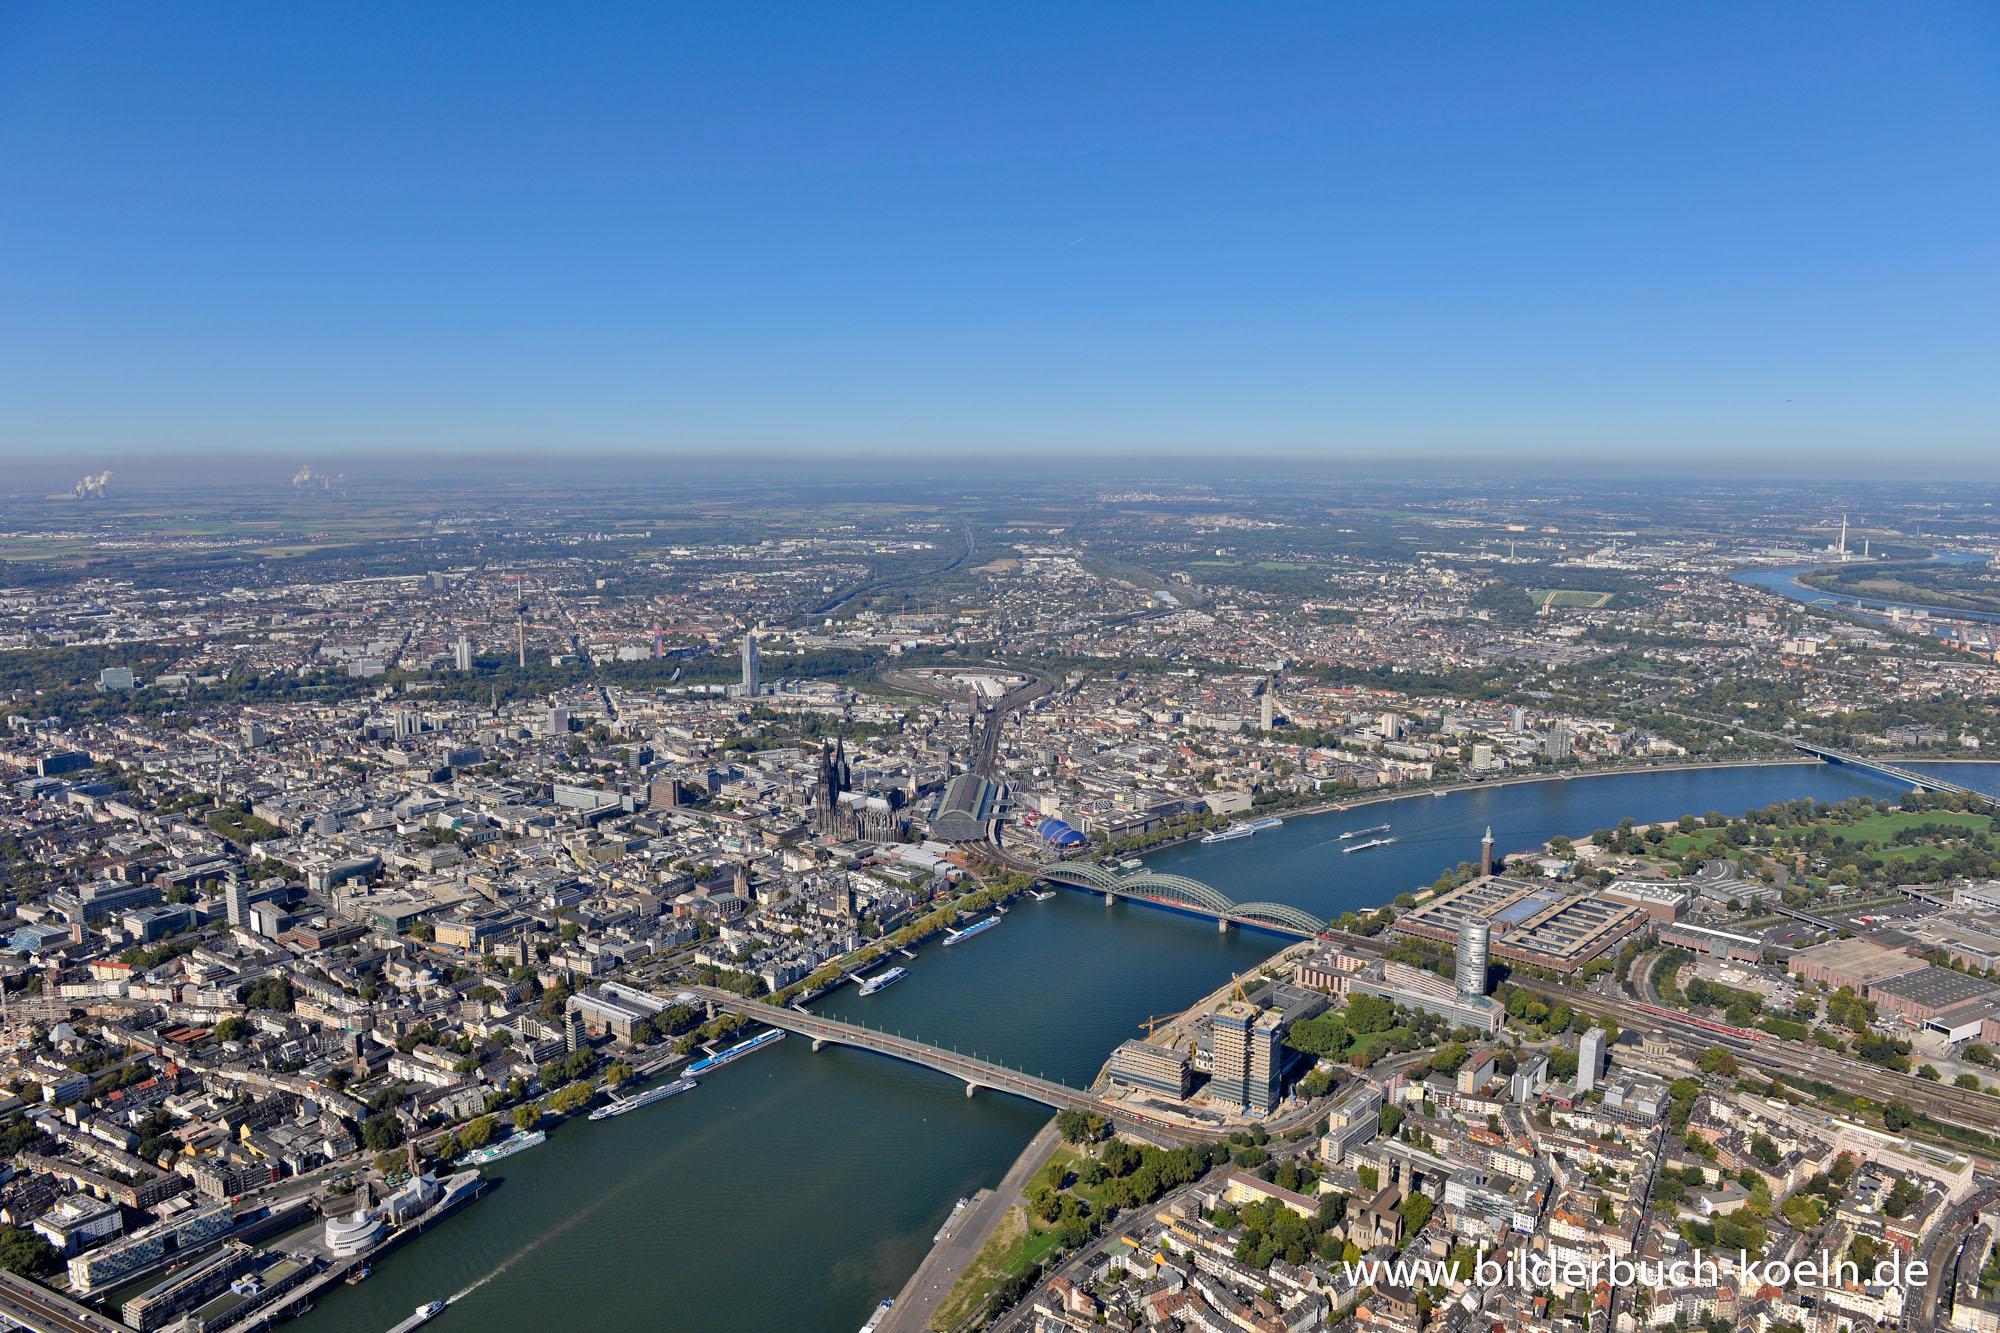 Koeln-Luftbild-2012-Cologne-aerial-view-bilderbuch-koeln